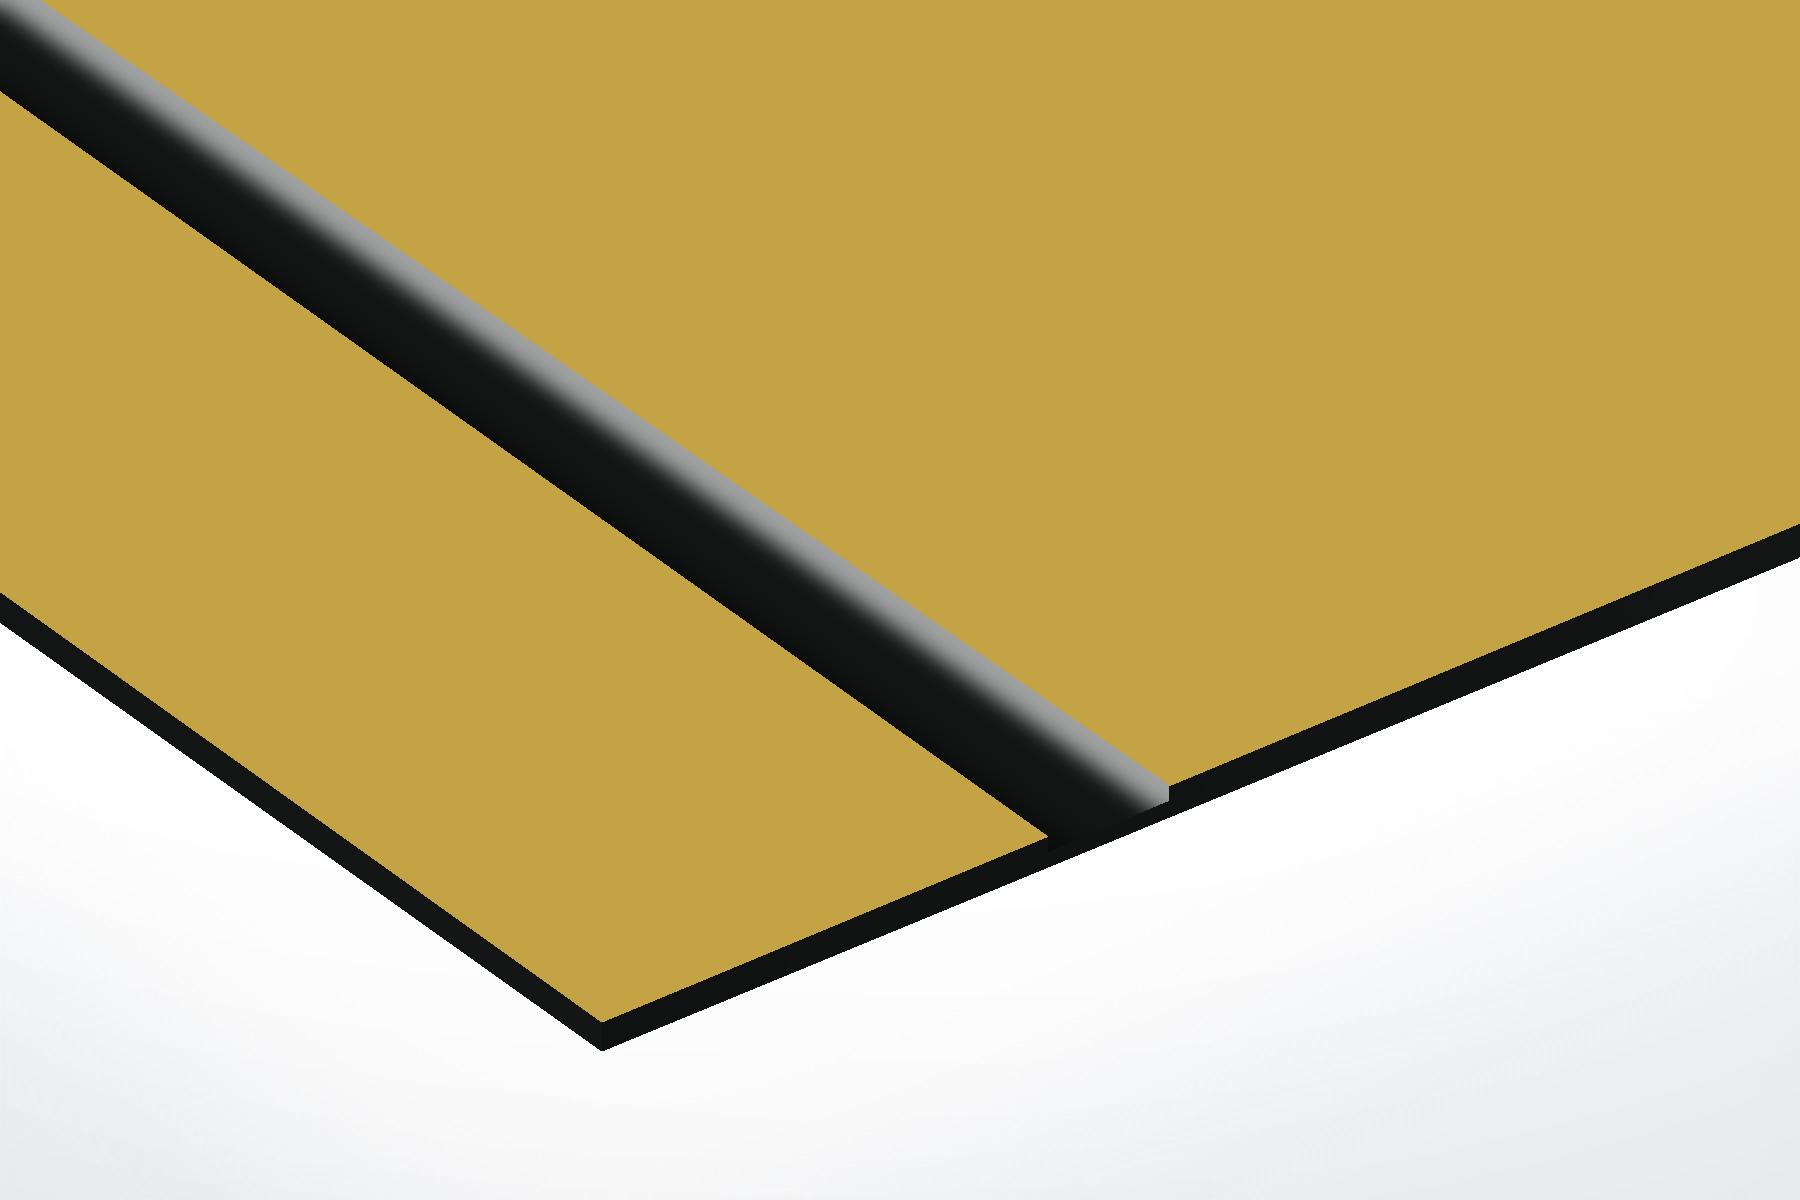 TroLase Lights Acrylic Foil